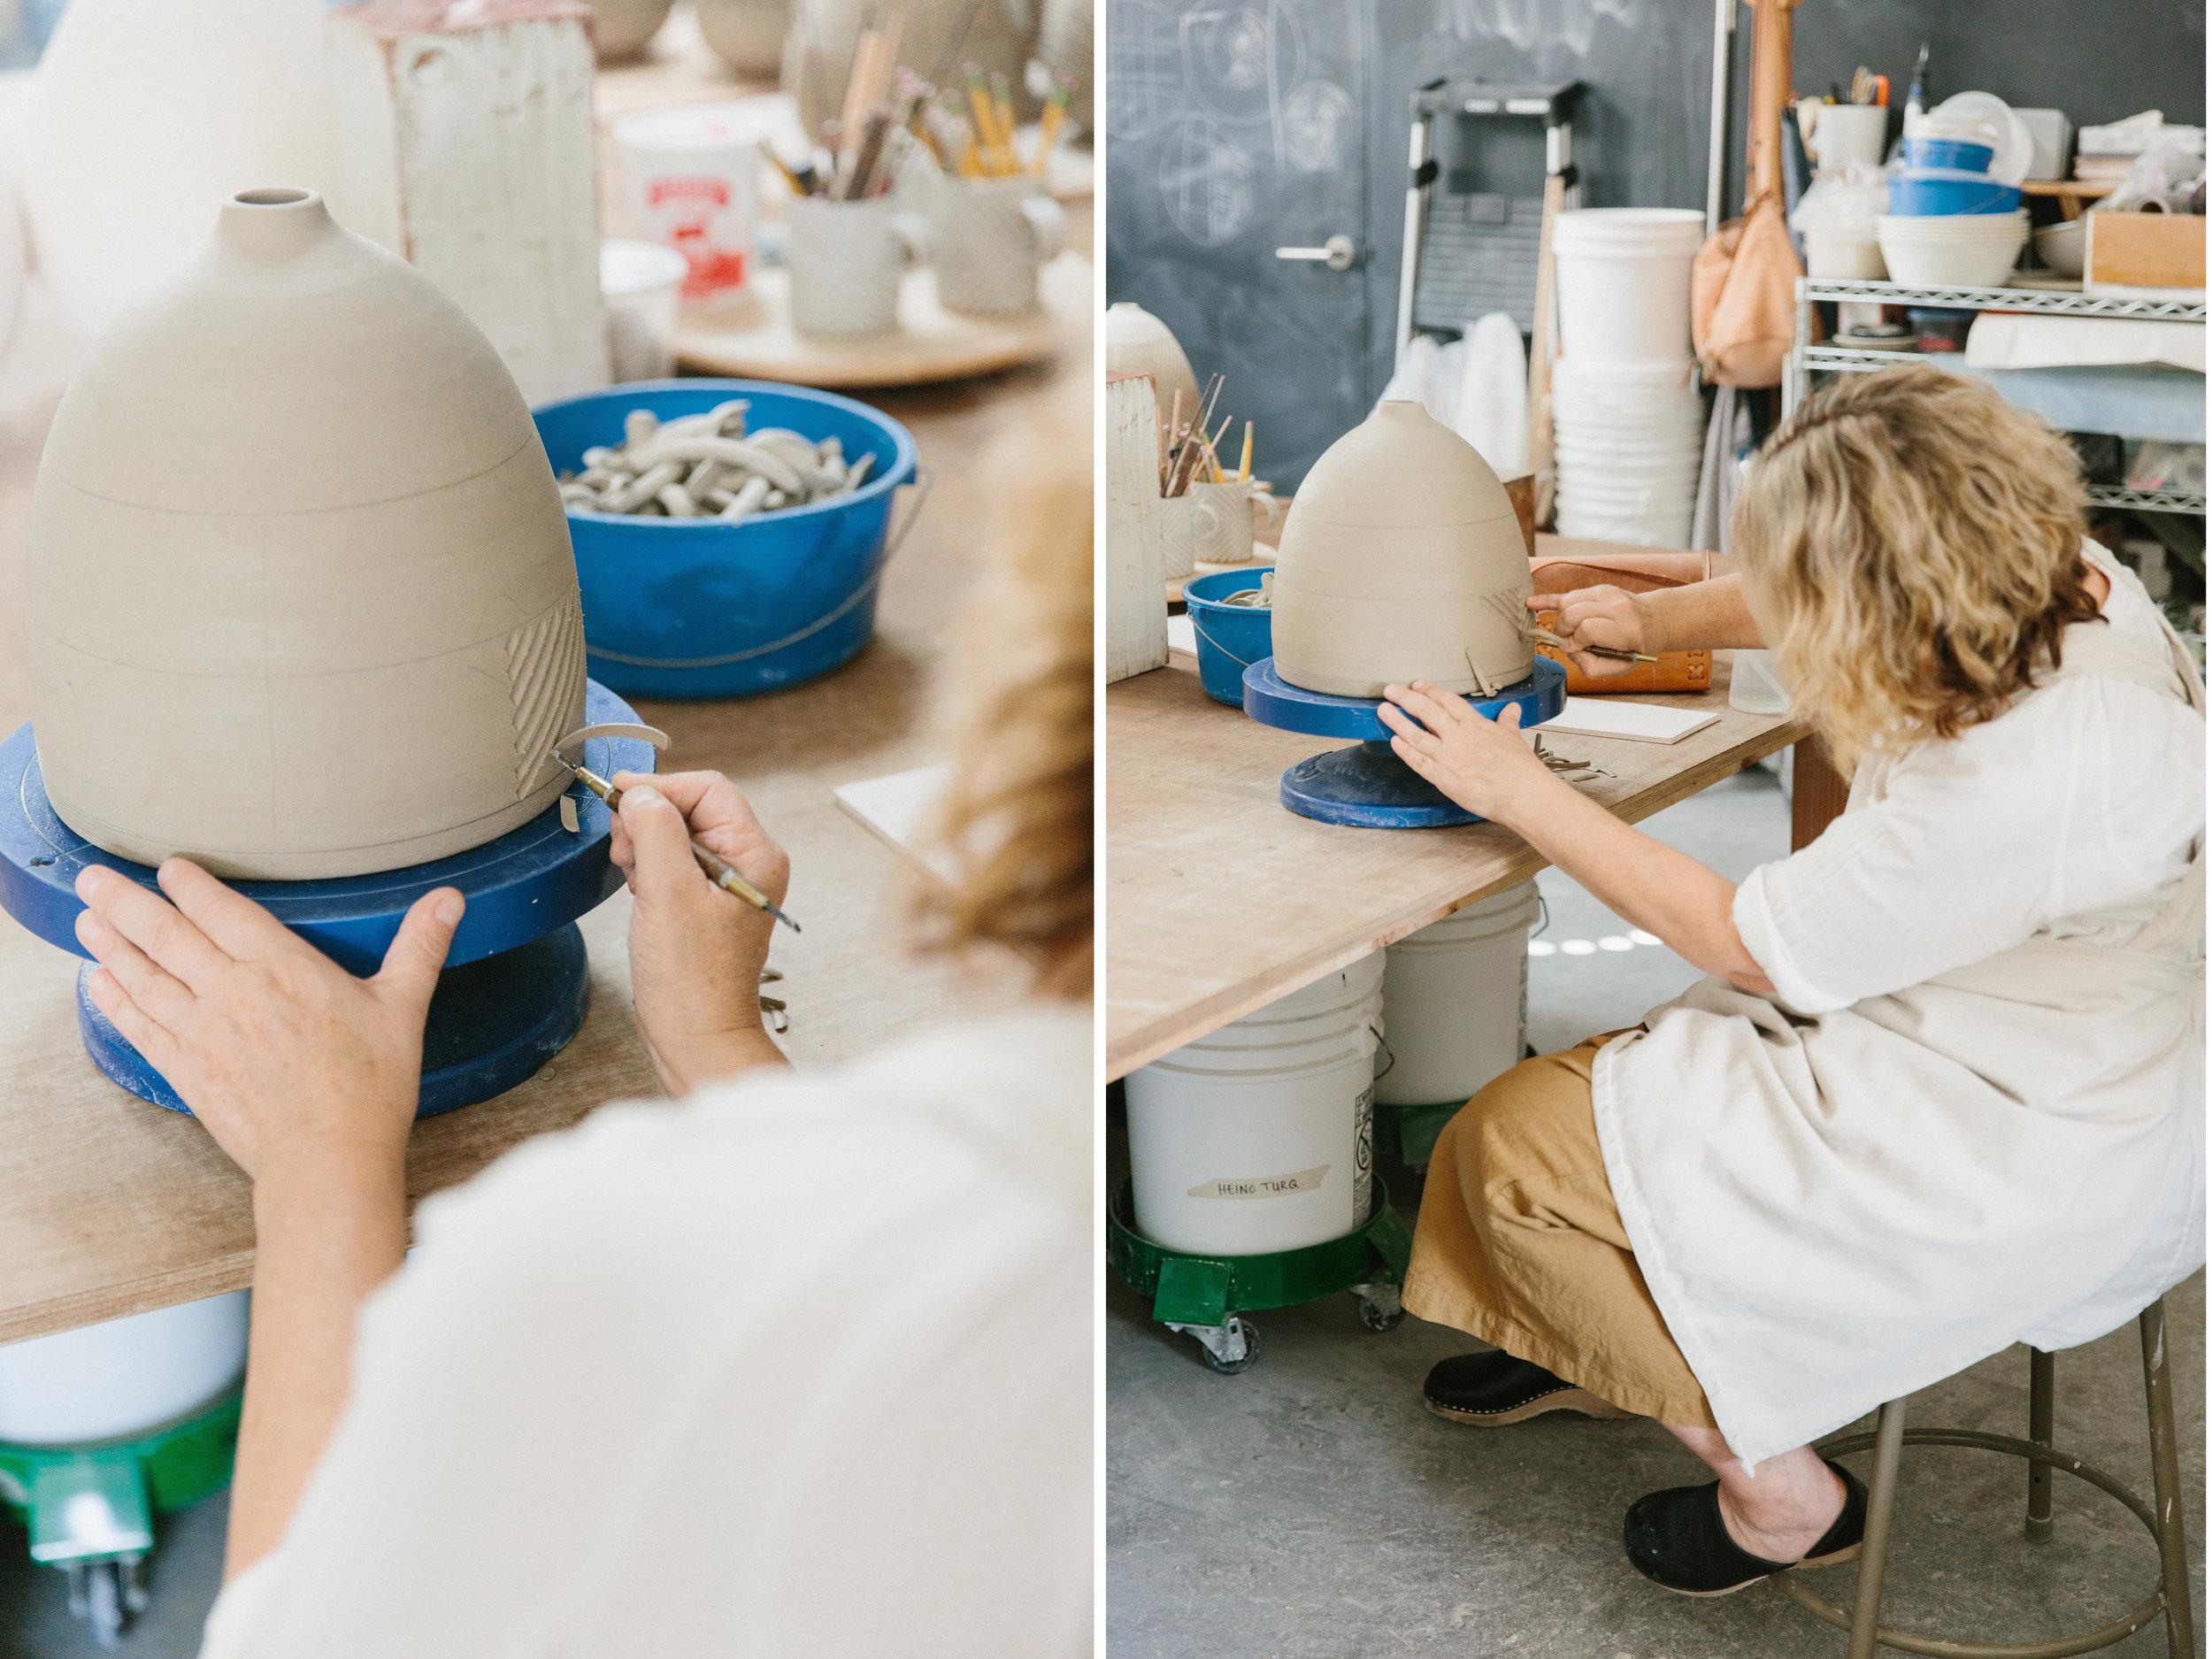 mt-washington-pottery_los-angeles-interior-home-studio-tour_jenni-kayne_nicki-sebastian-photography_2.jpg